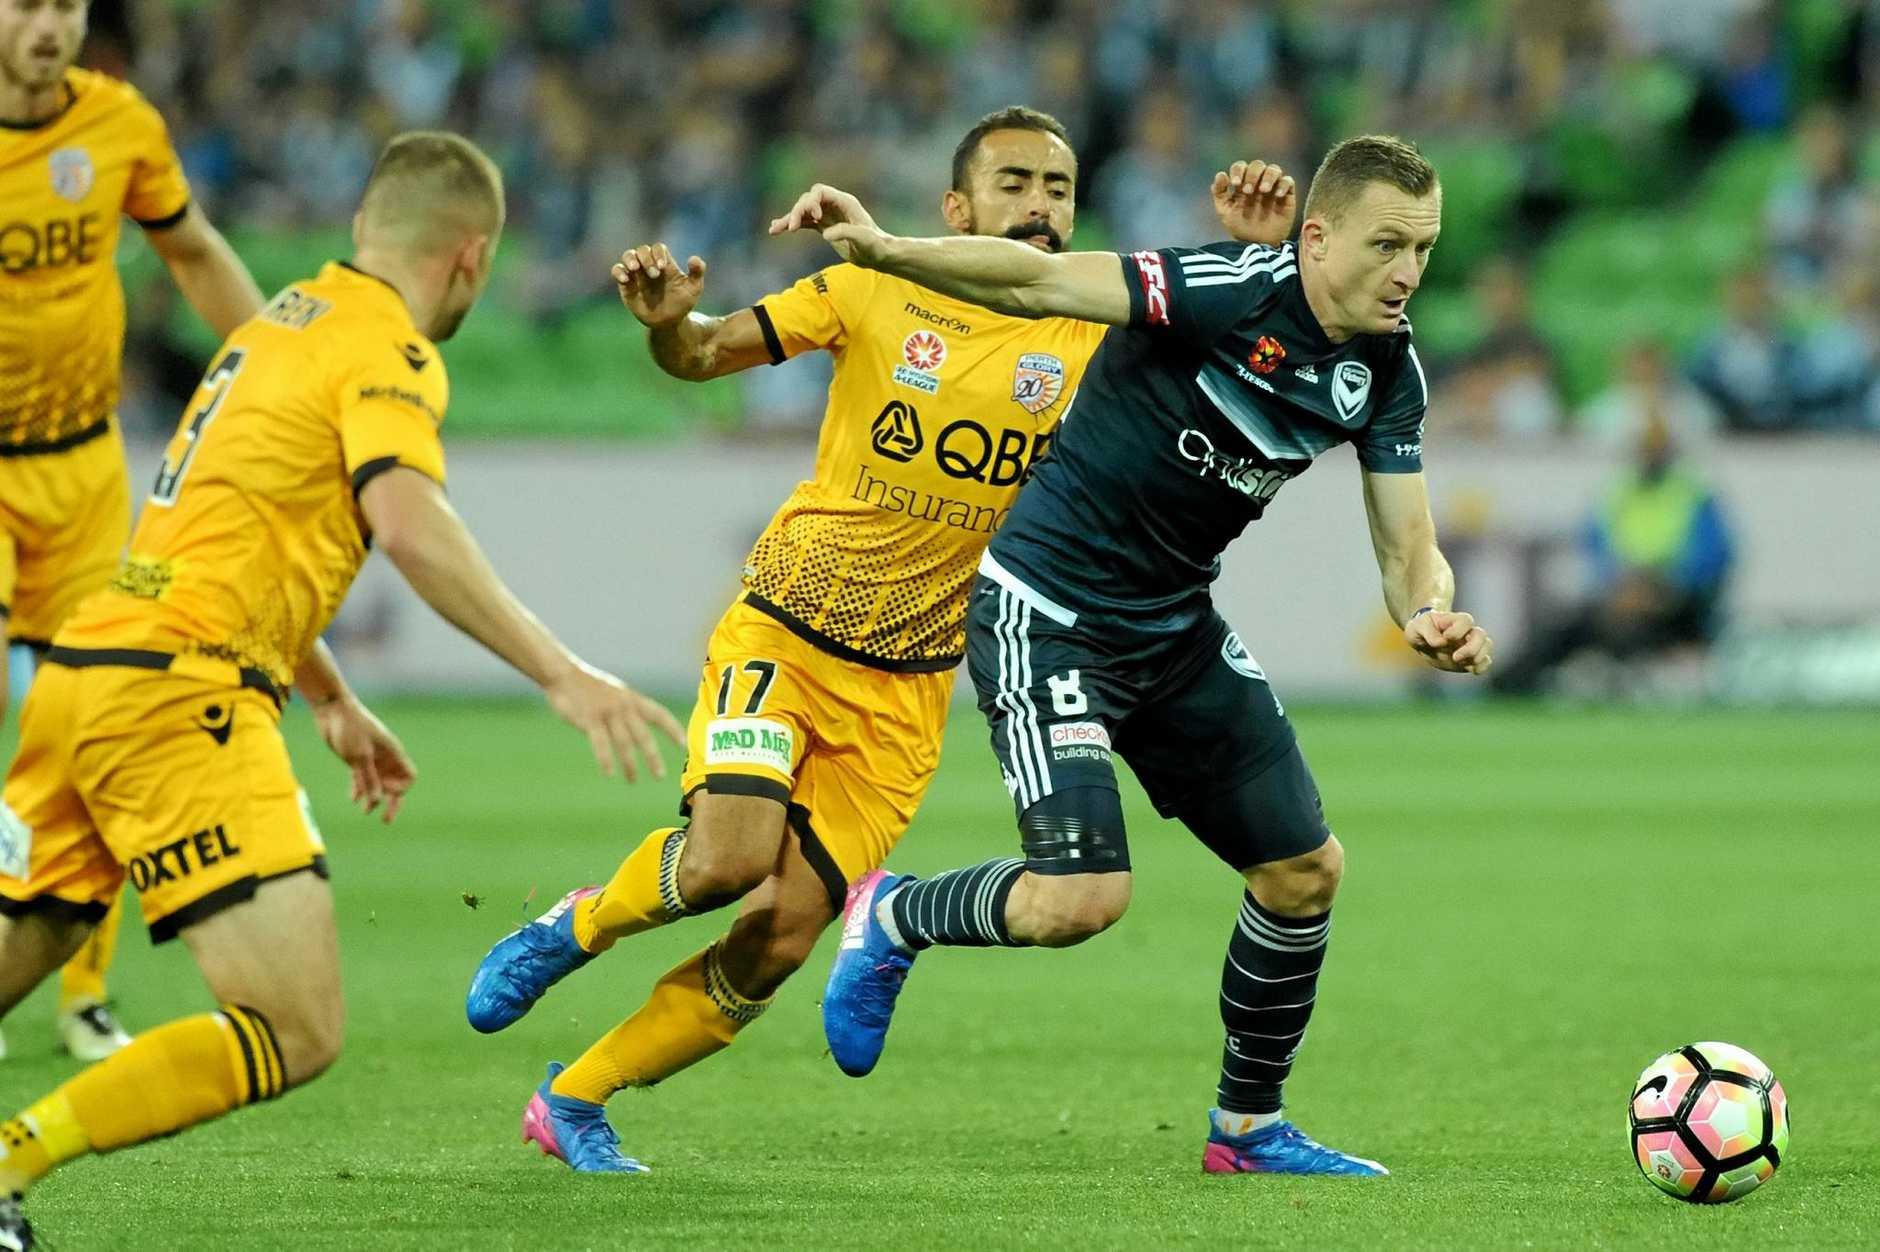 Besart Berisha (right) has scored 99 goals in the A-League.